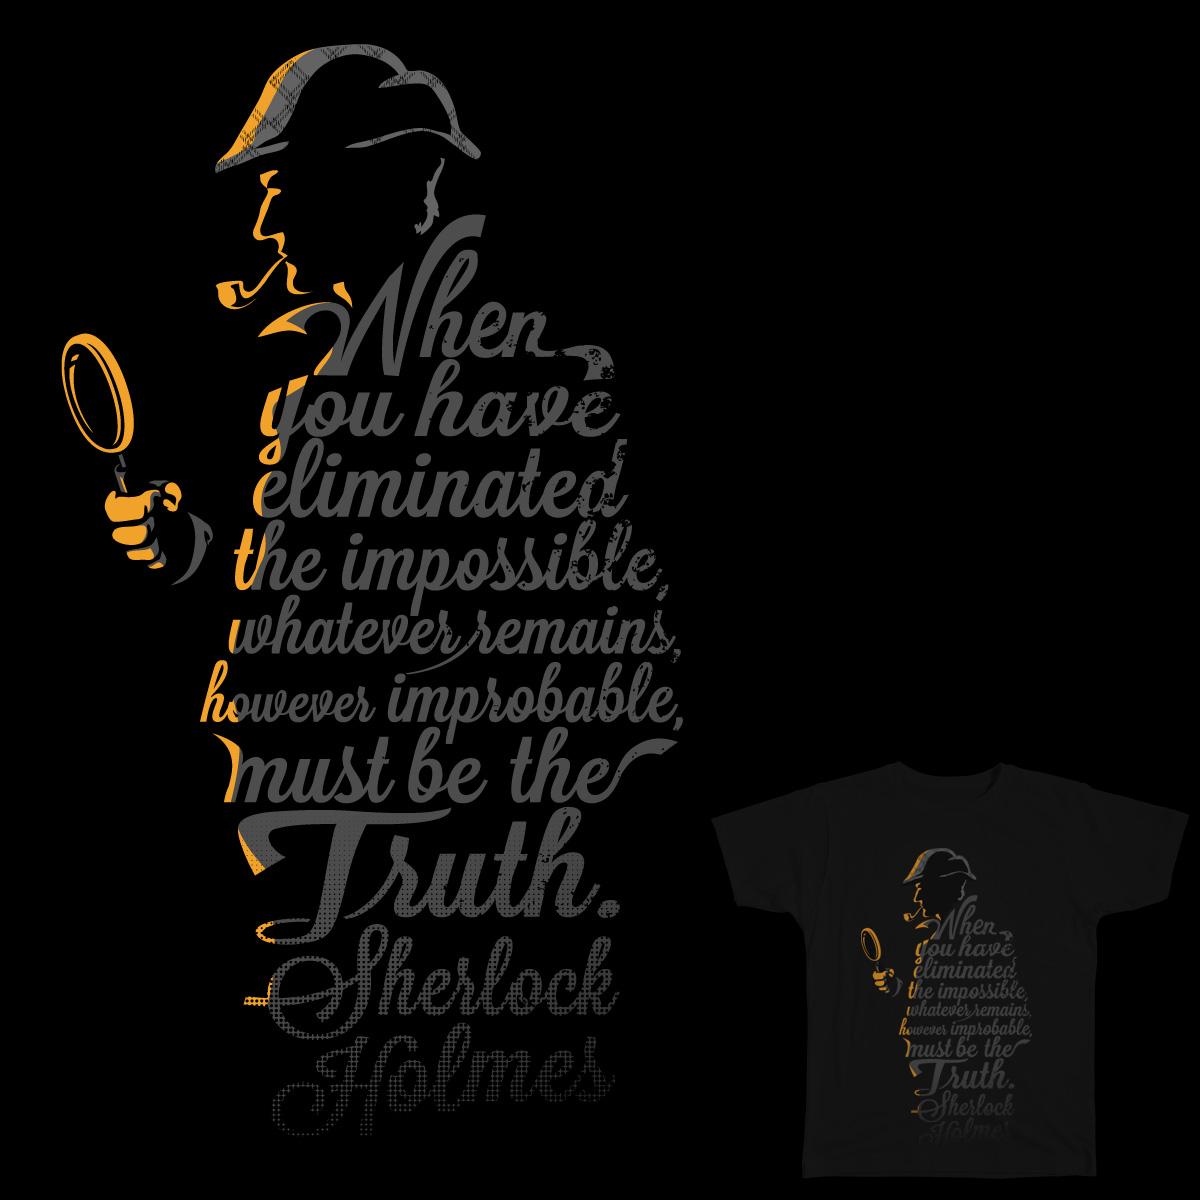 Sherlock's Truth by Iconwalk on Threadless